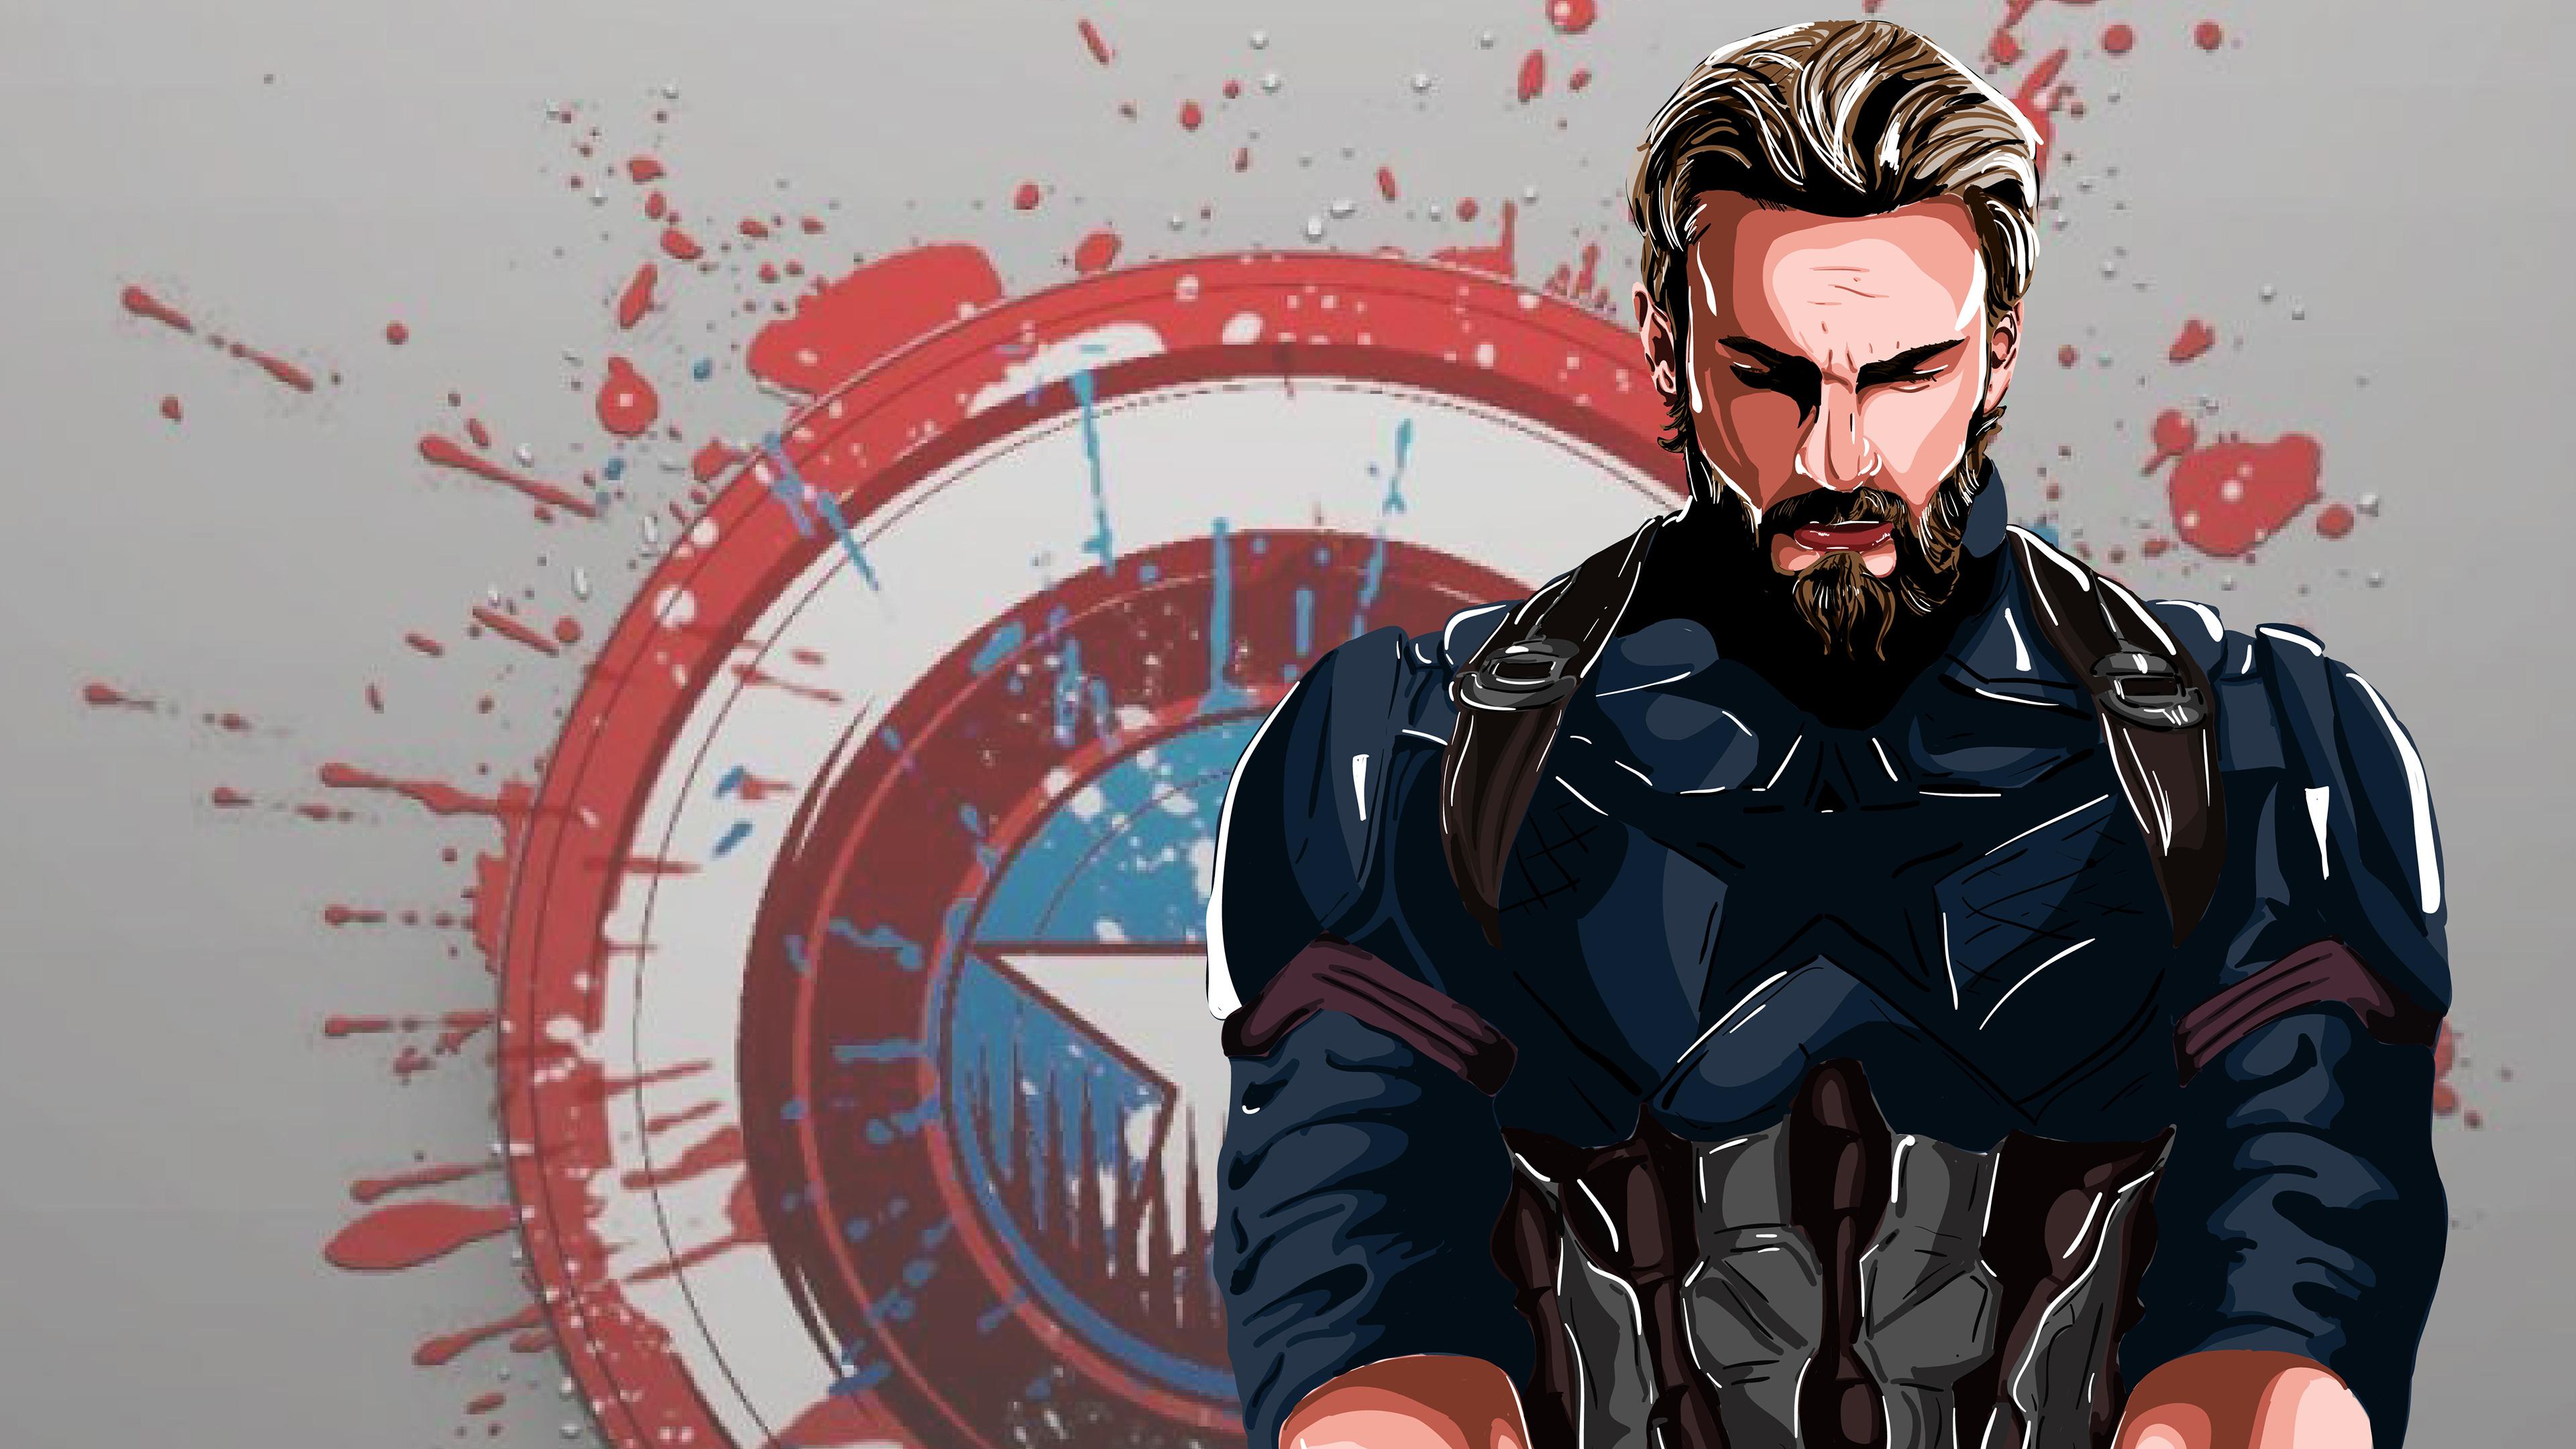 Captain America New Art 4k, HD Superheroes, 4k Wallpapers